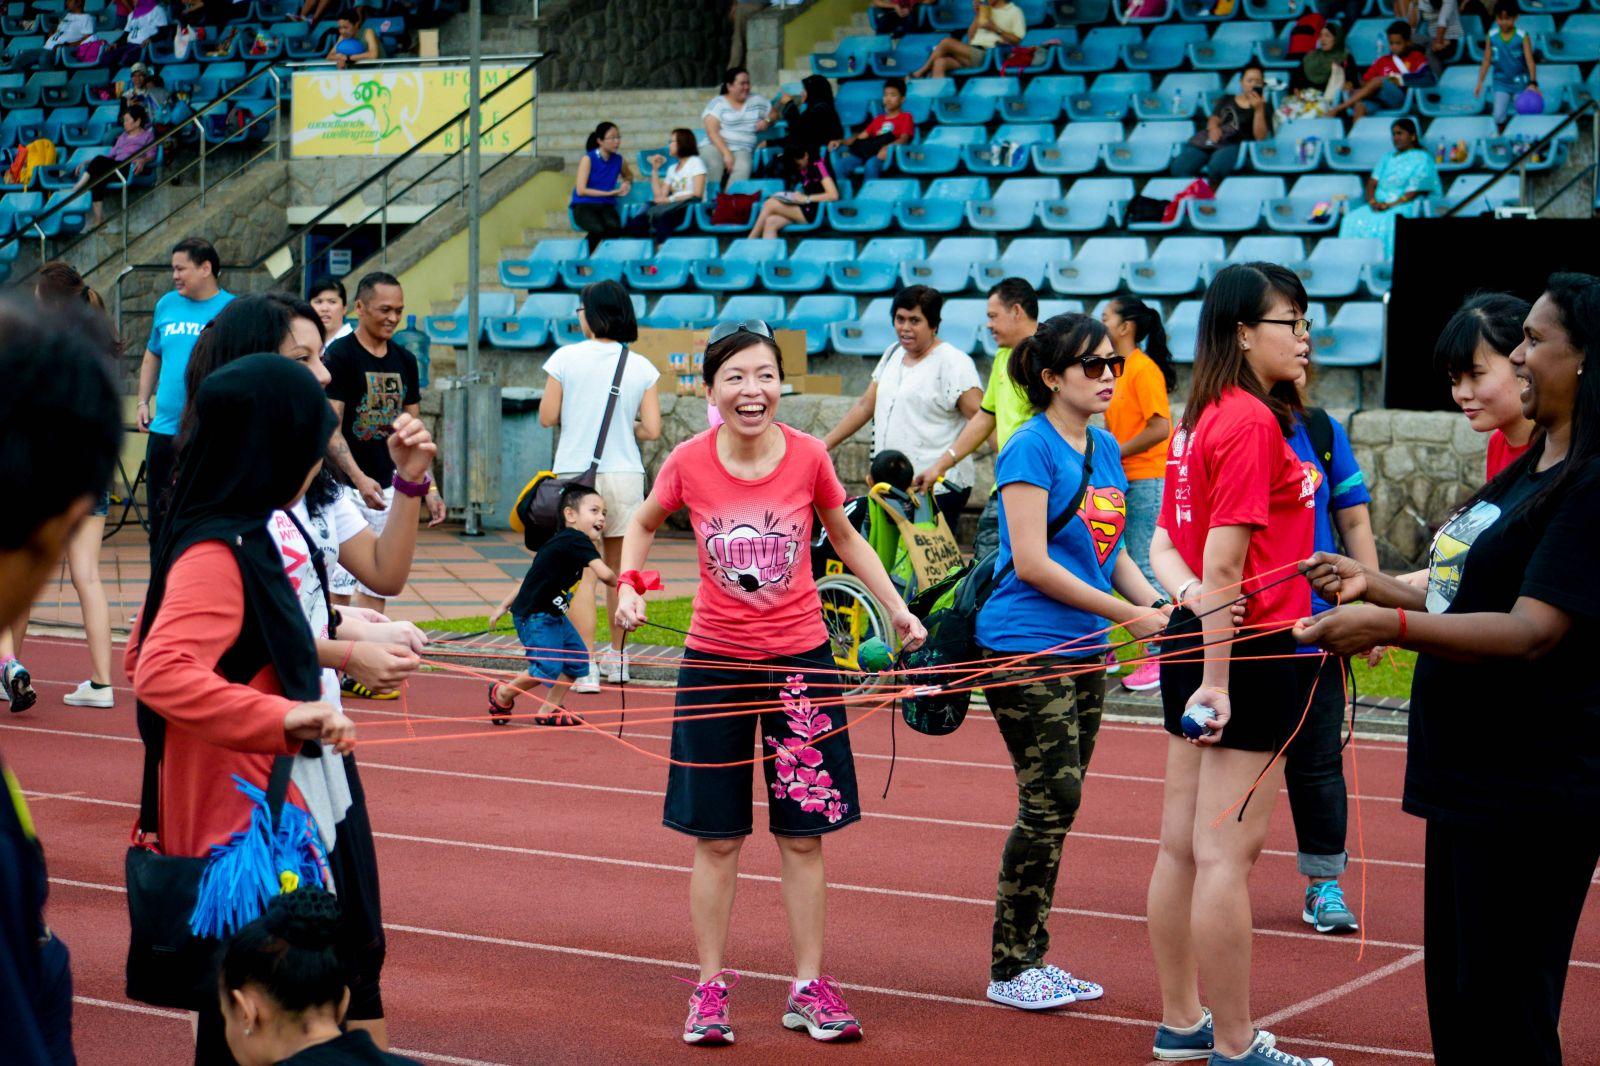 Club Rainbow Singapore Annual Party 2014 -5.jpg